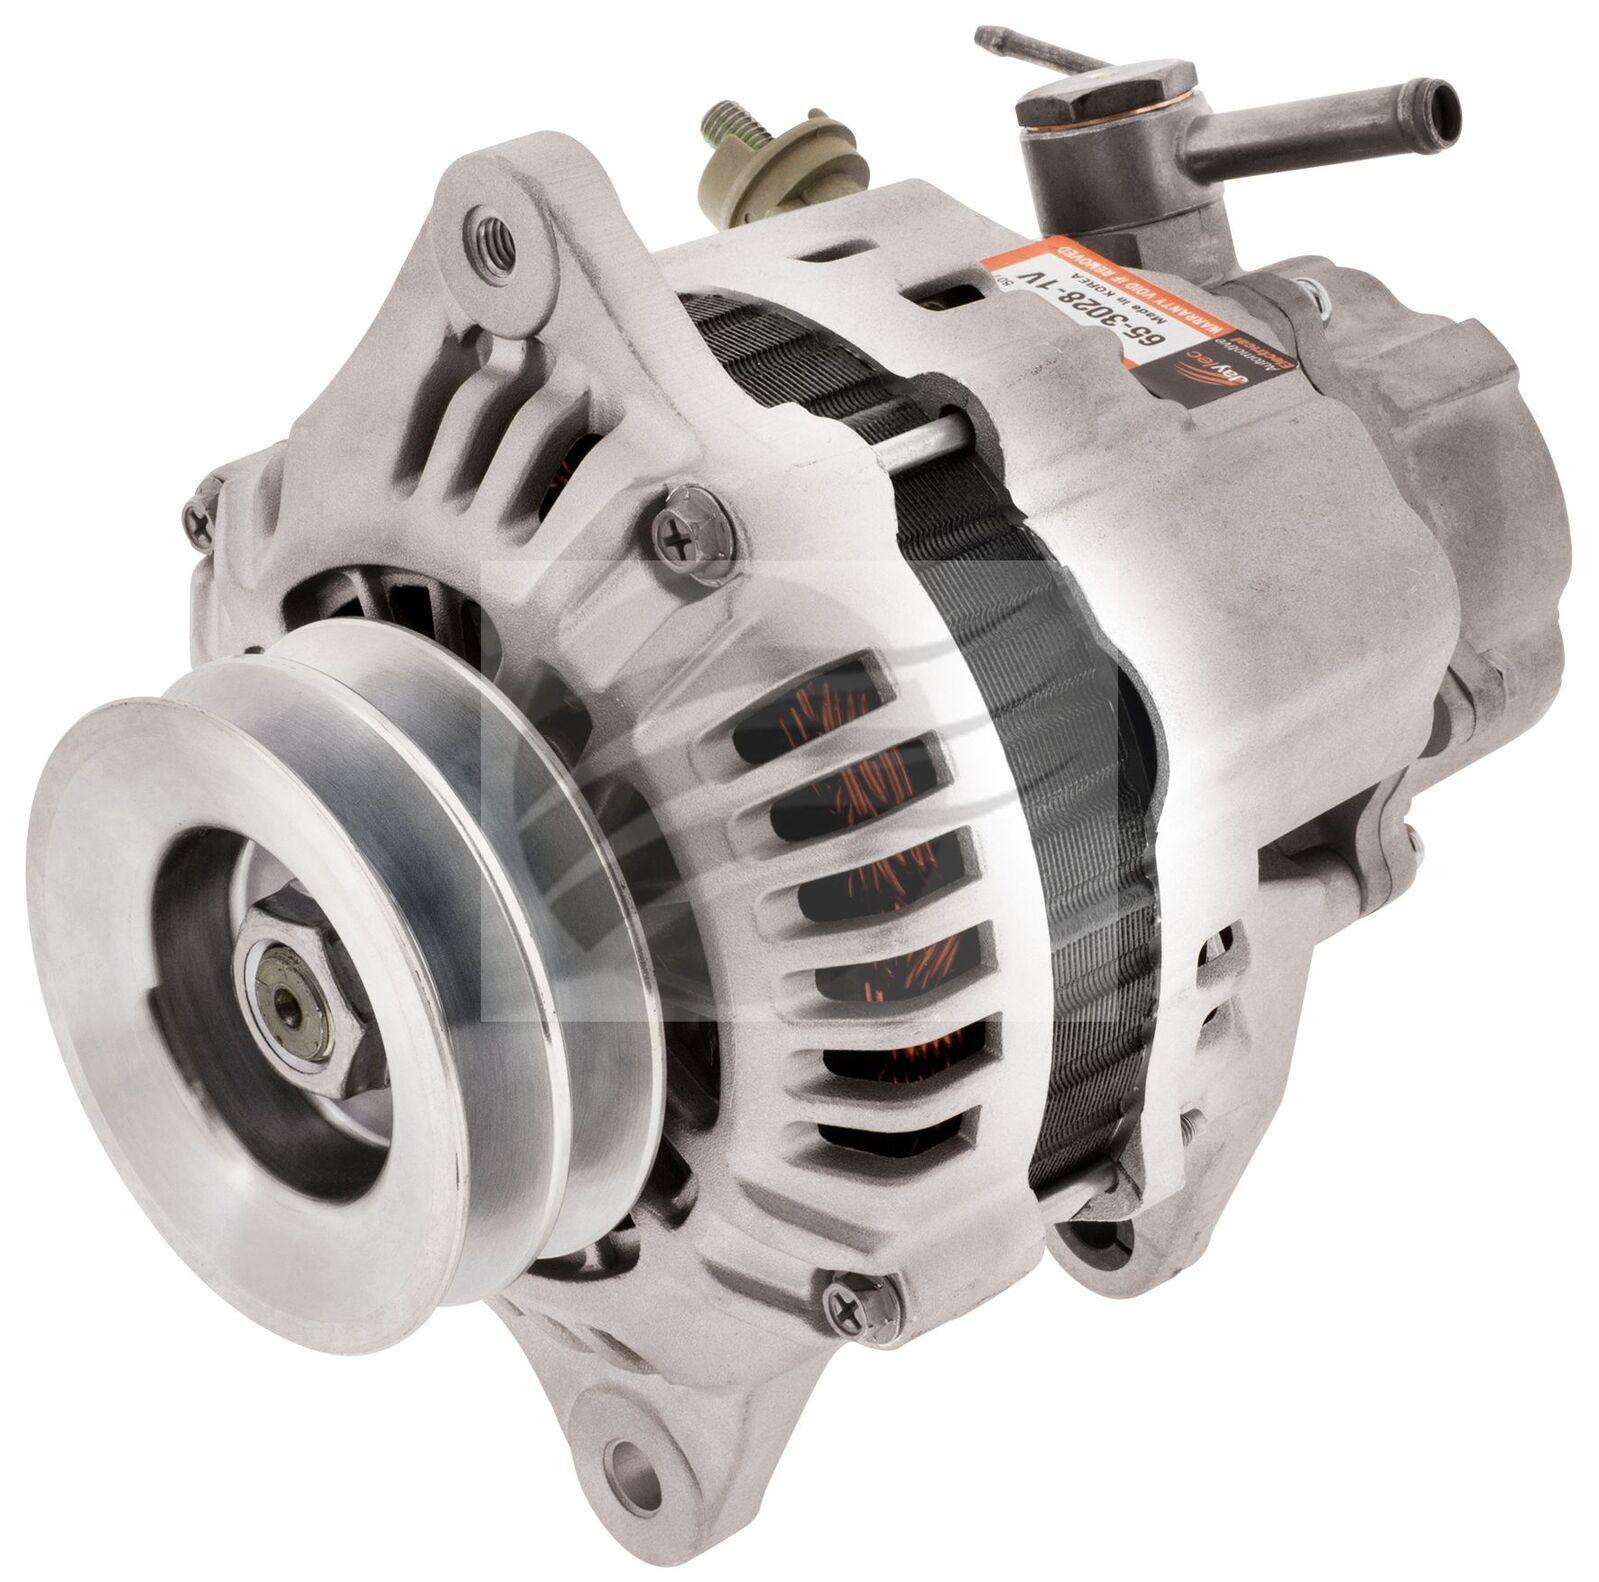 Jaylec alternator 100 amp for Nissan Patrol GQ Y60 4.2 D 4x4 88-99 TD42 Diesel